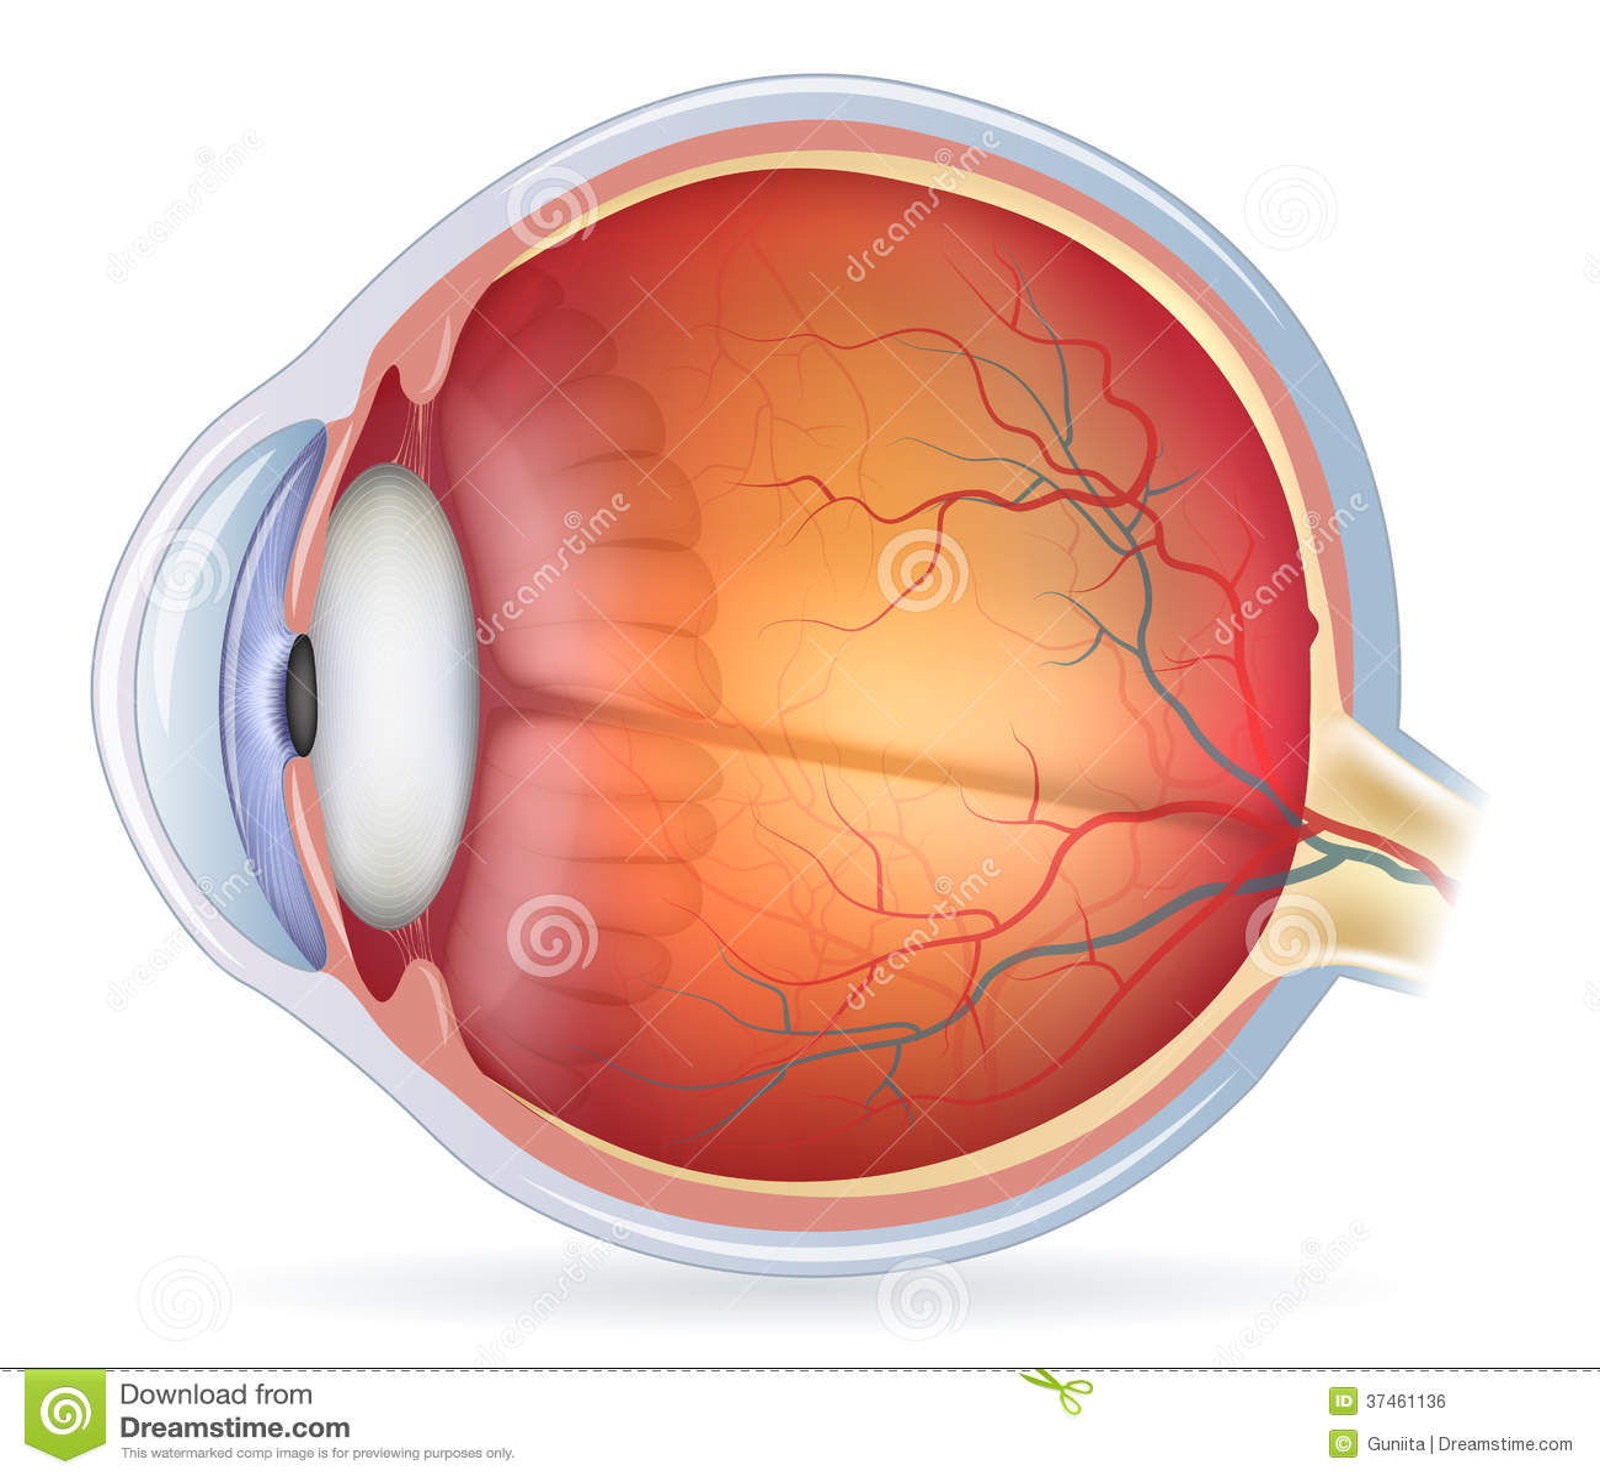 hight resolution of detailed human eye anatomical illustration stock vector rh dreamstime com eye anatomy diagram human eye diagram unlabeled